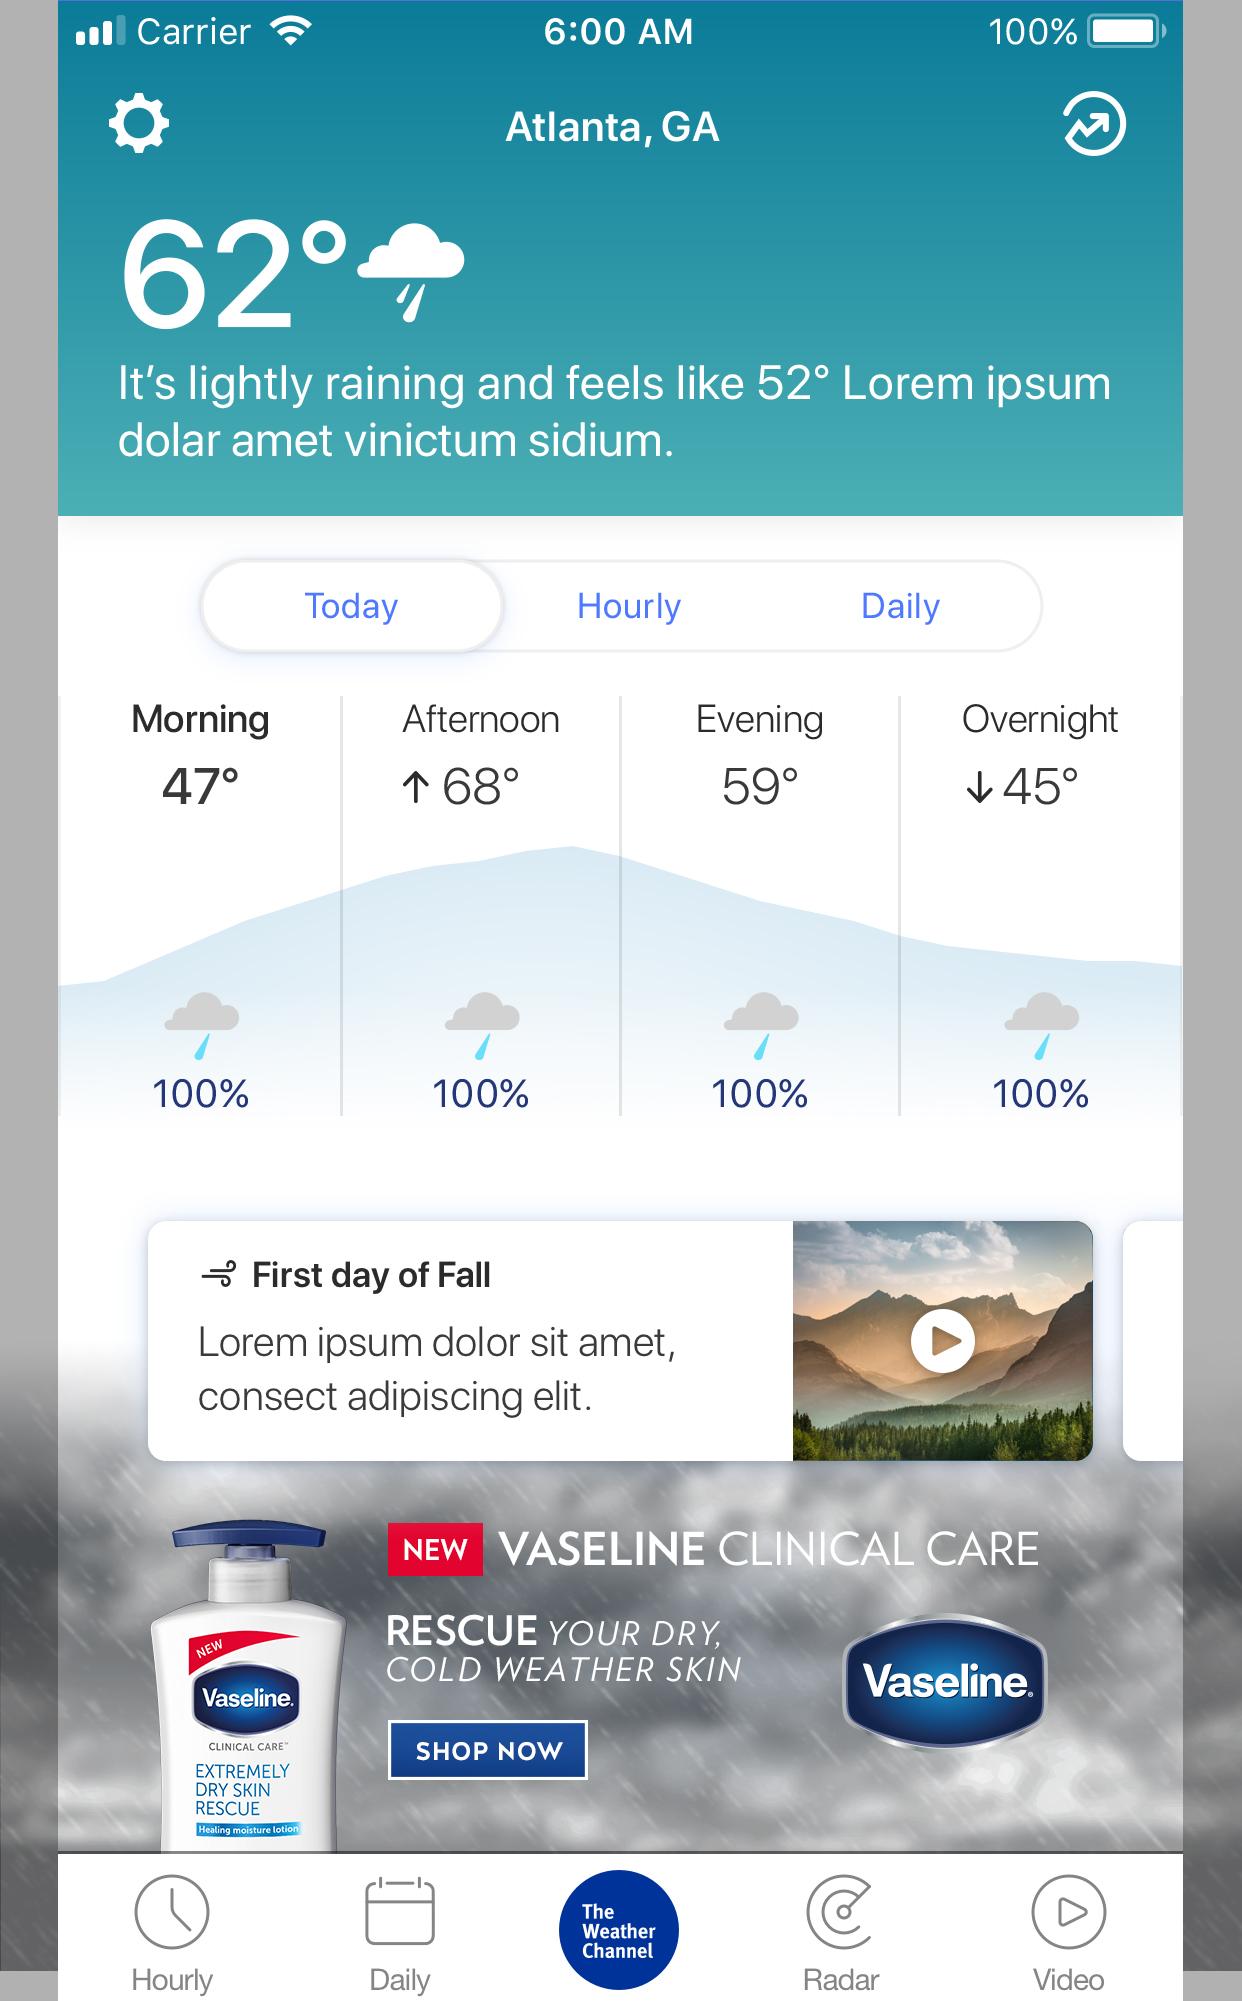 Vaseline_IM_0004_Rainy Day